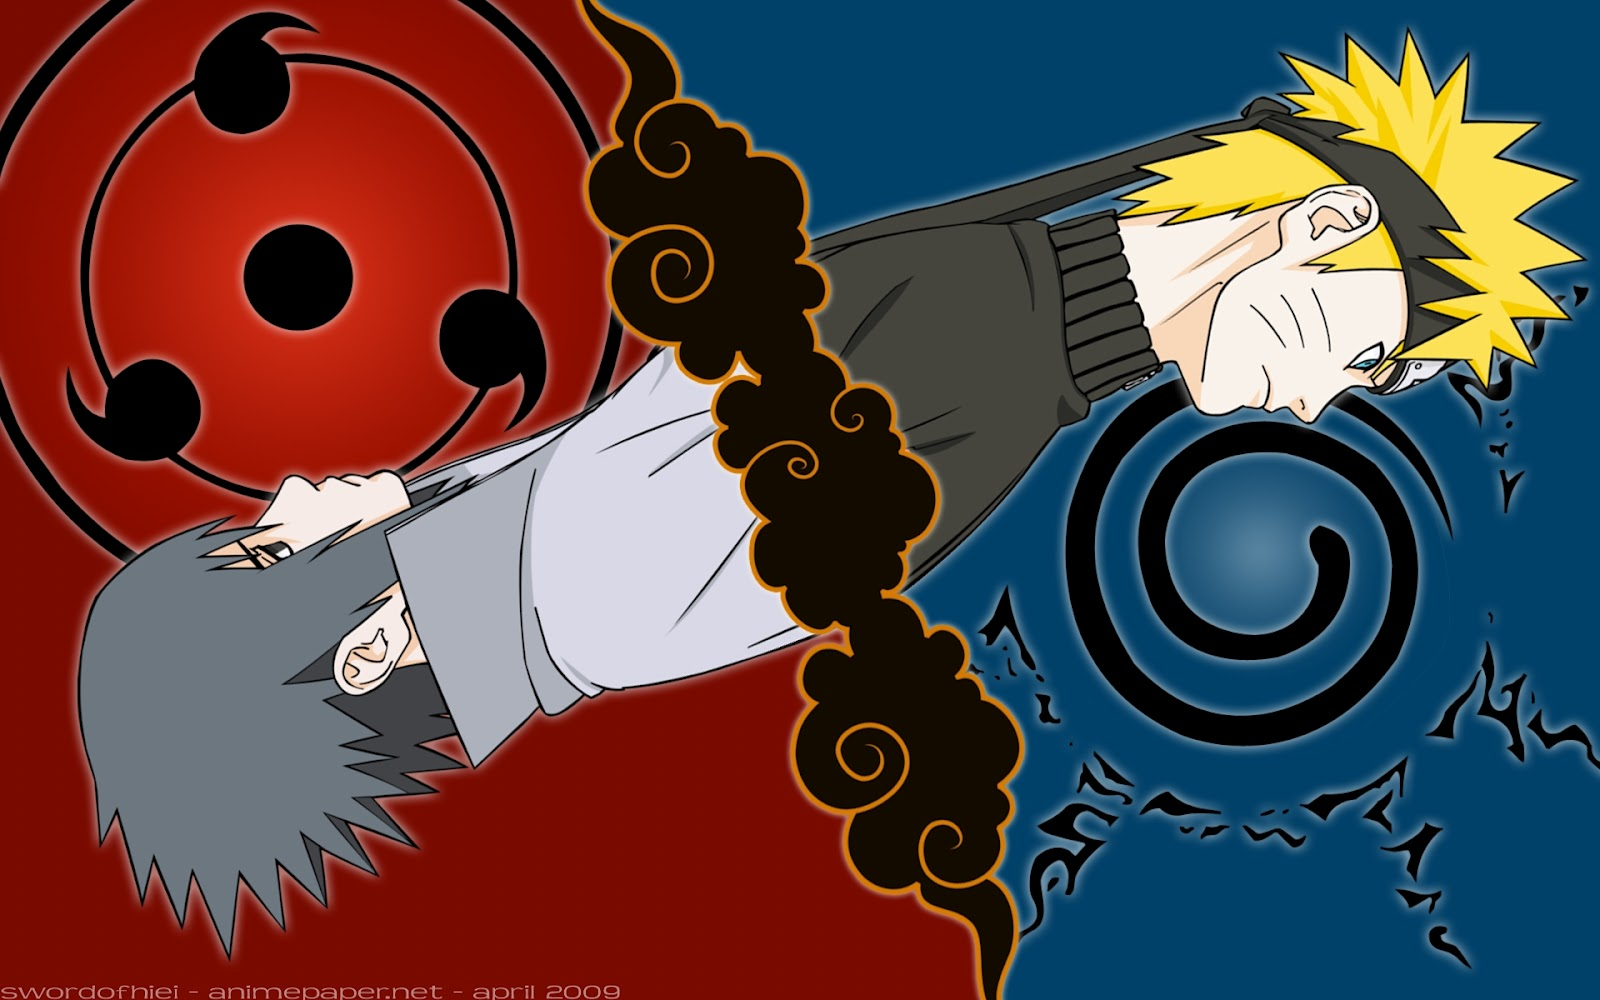 Naruto Shippuden Wallpaper Sasuke 10622 Hd Wallpapers in Anime 1600x1000